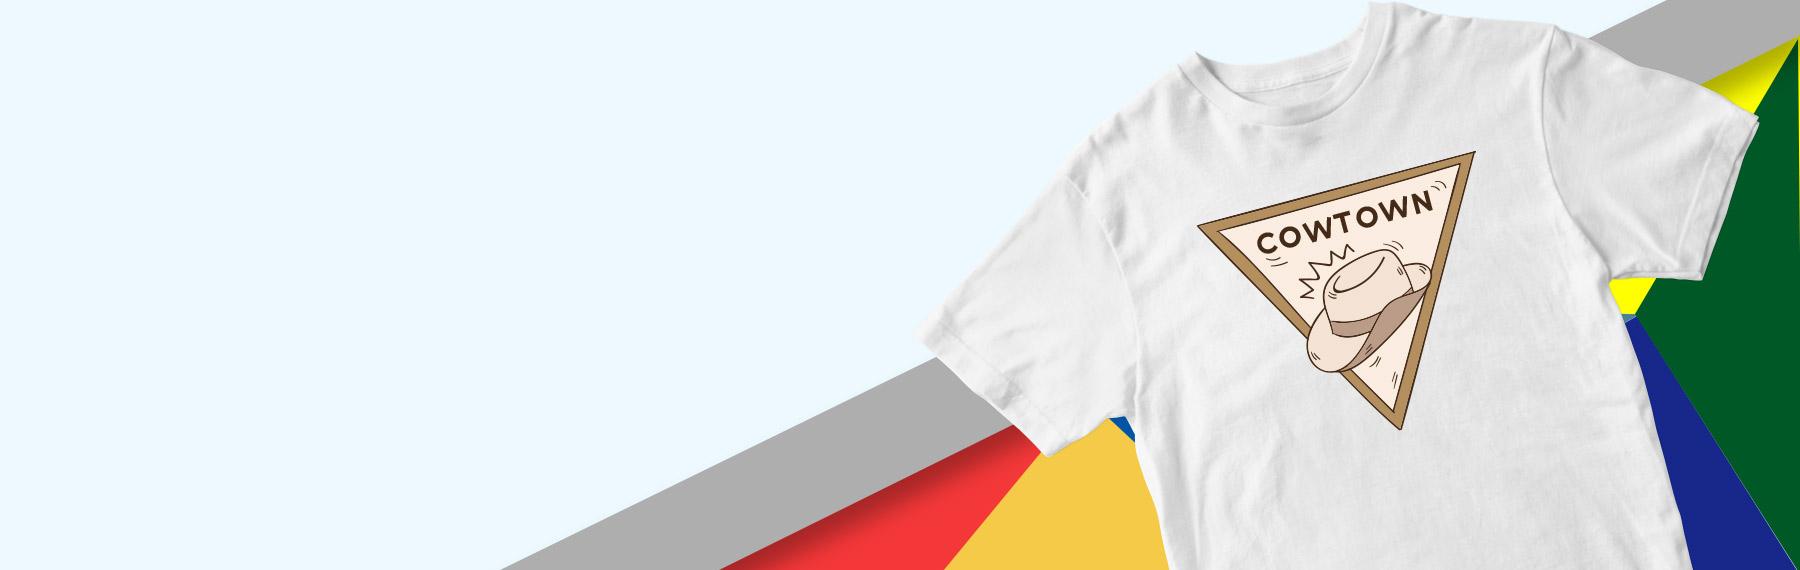 f4cdee0a0 Order Custom T-Shirts in Calgary | T-Shirt Elephant